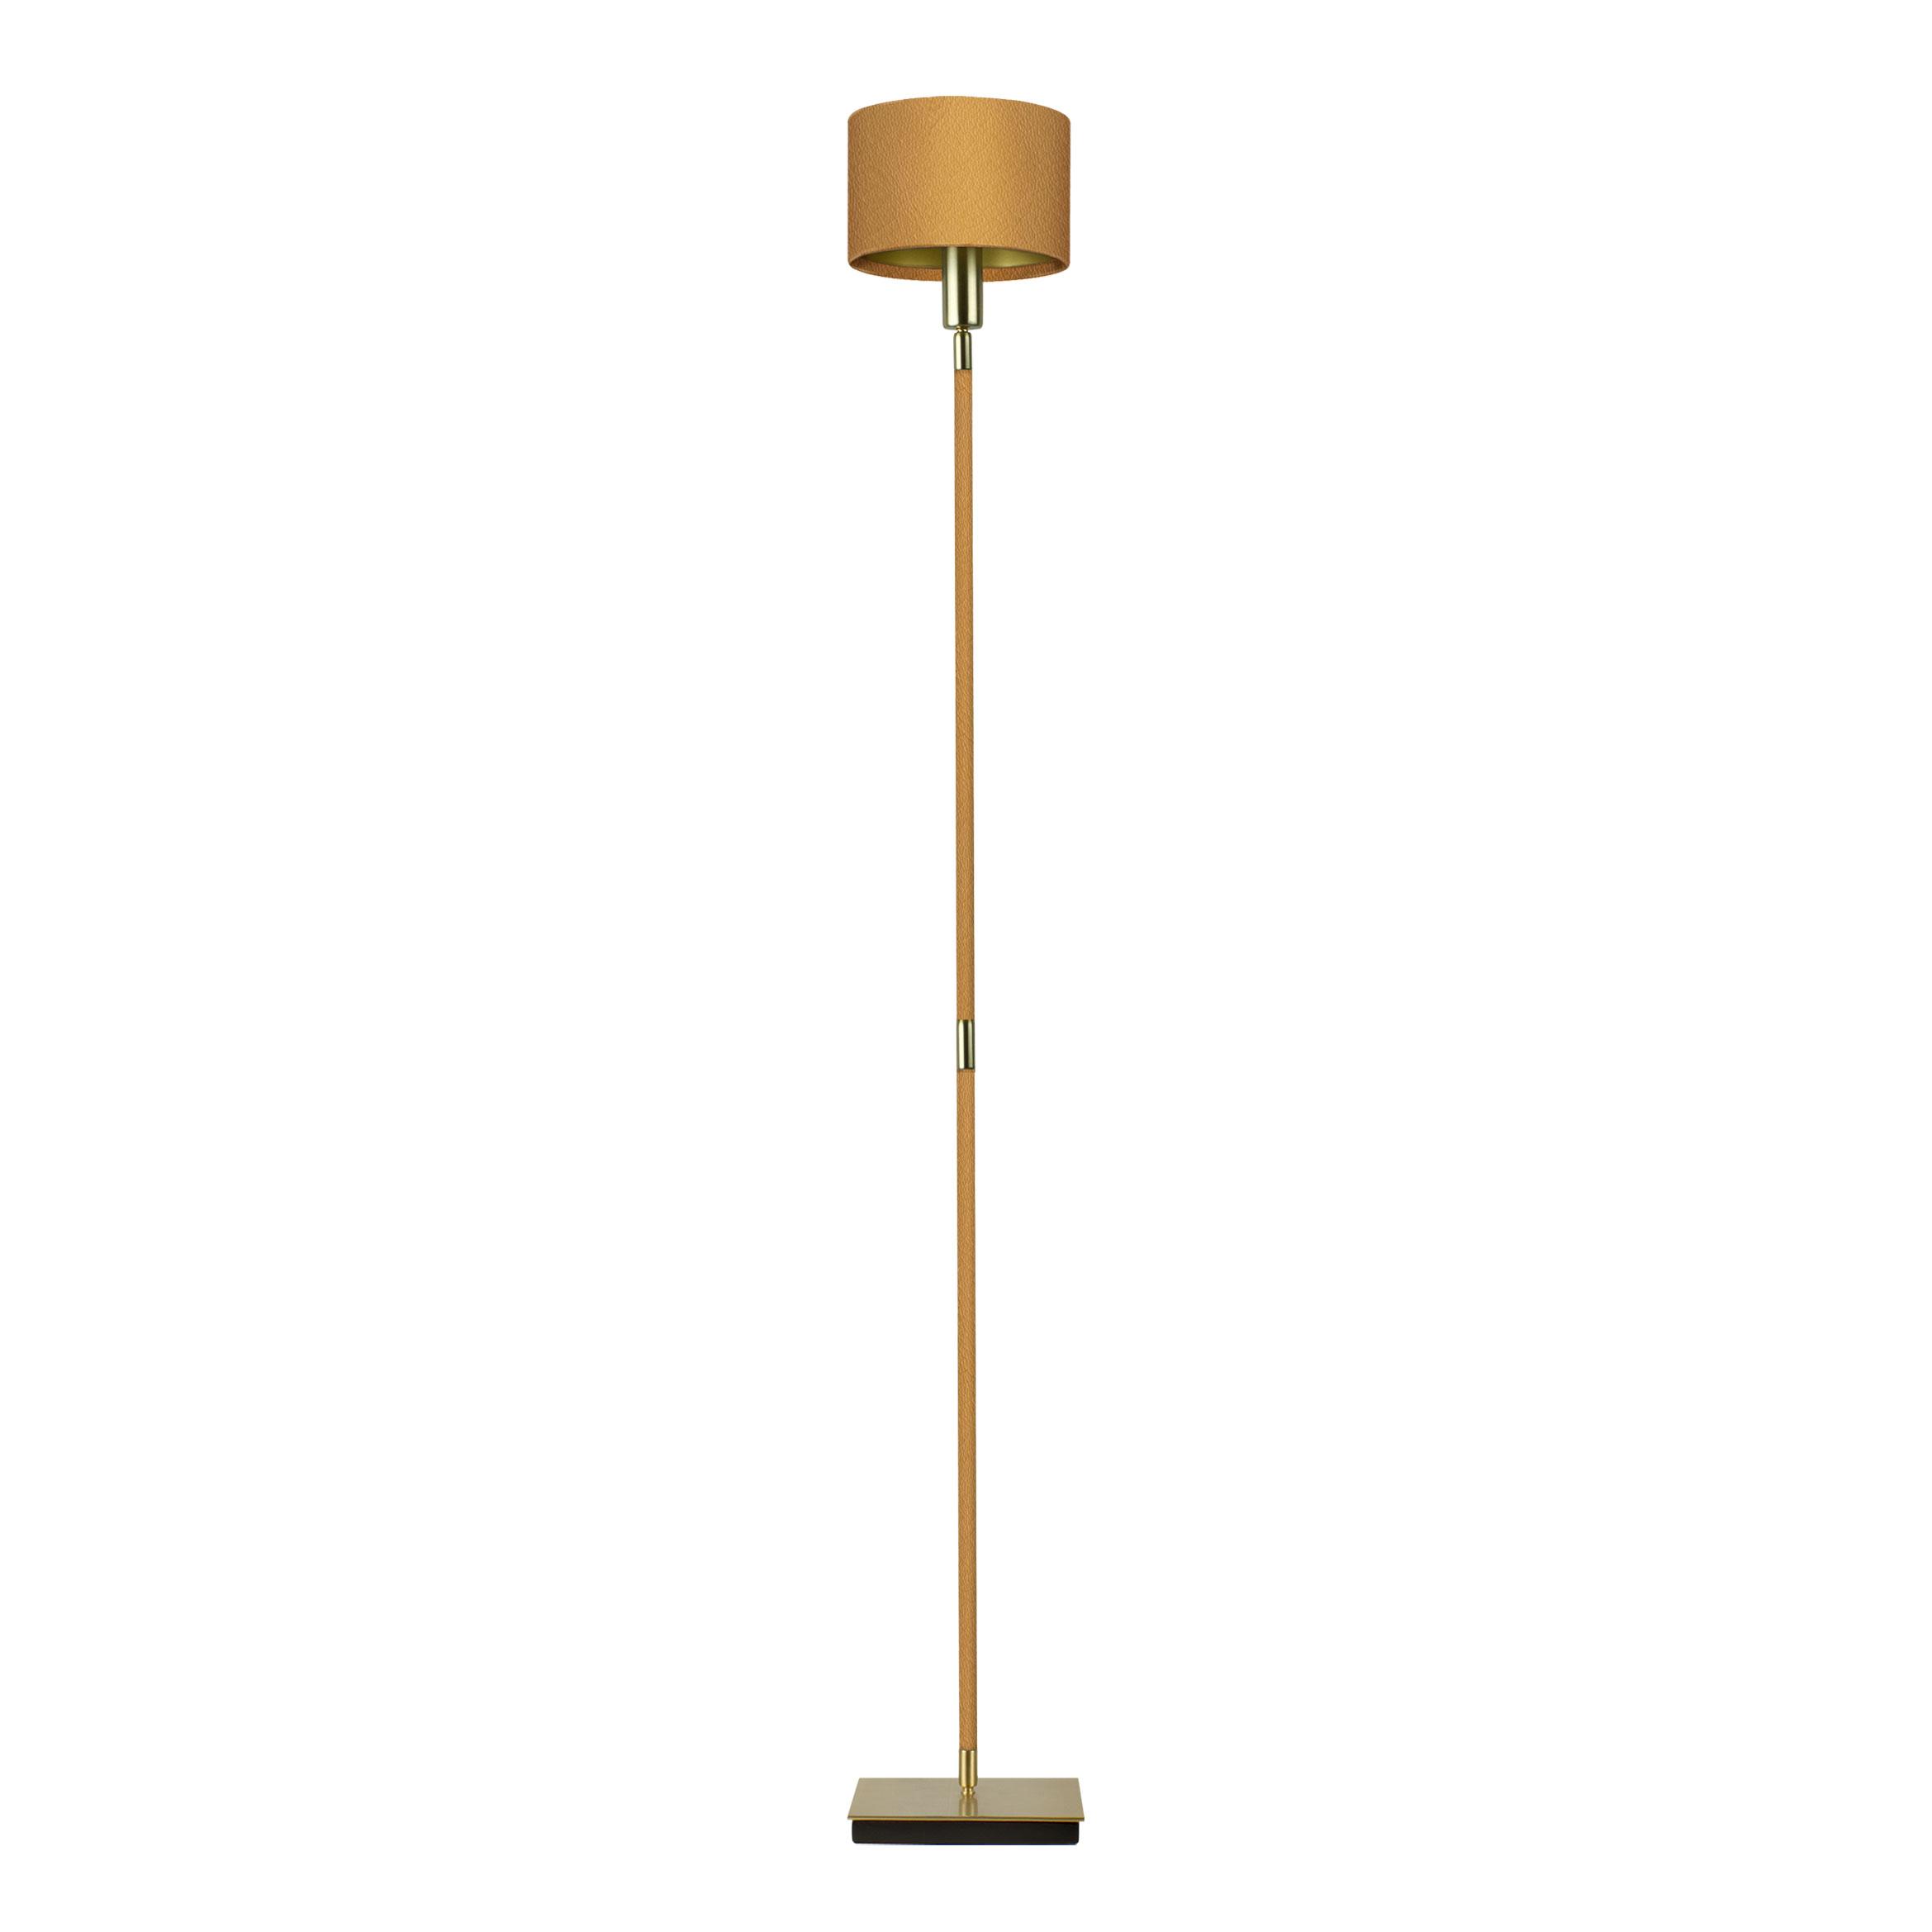 Linea villaverde london villaverde london linea metal leather floor lamp square aloadofball Images